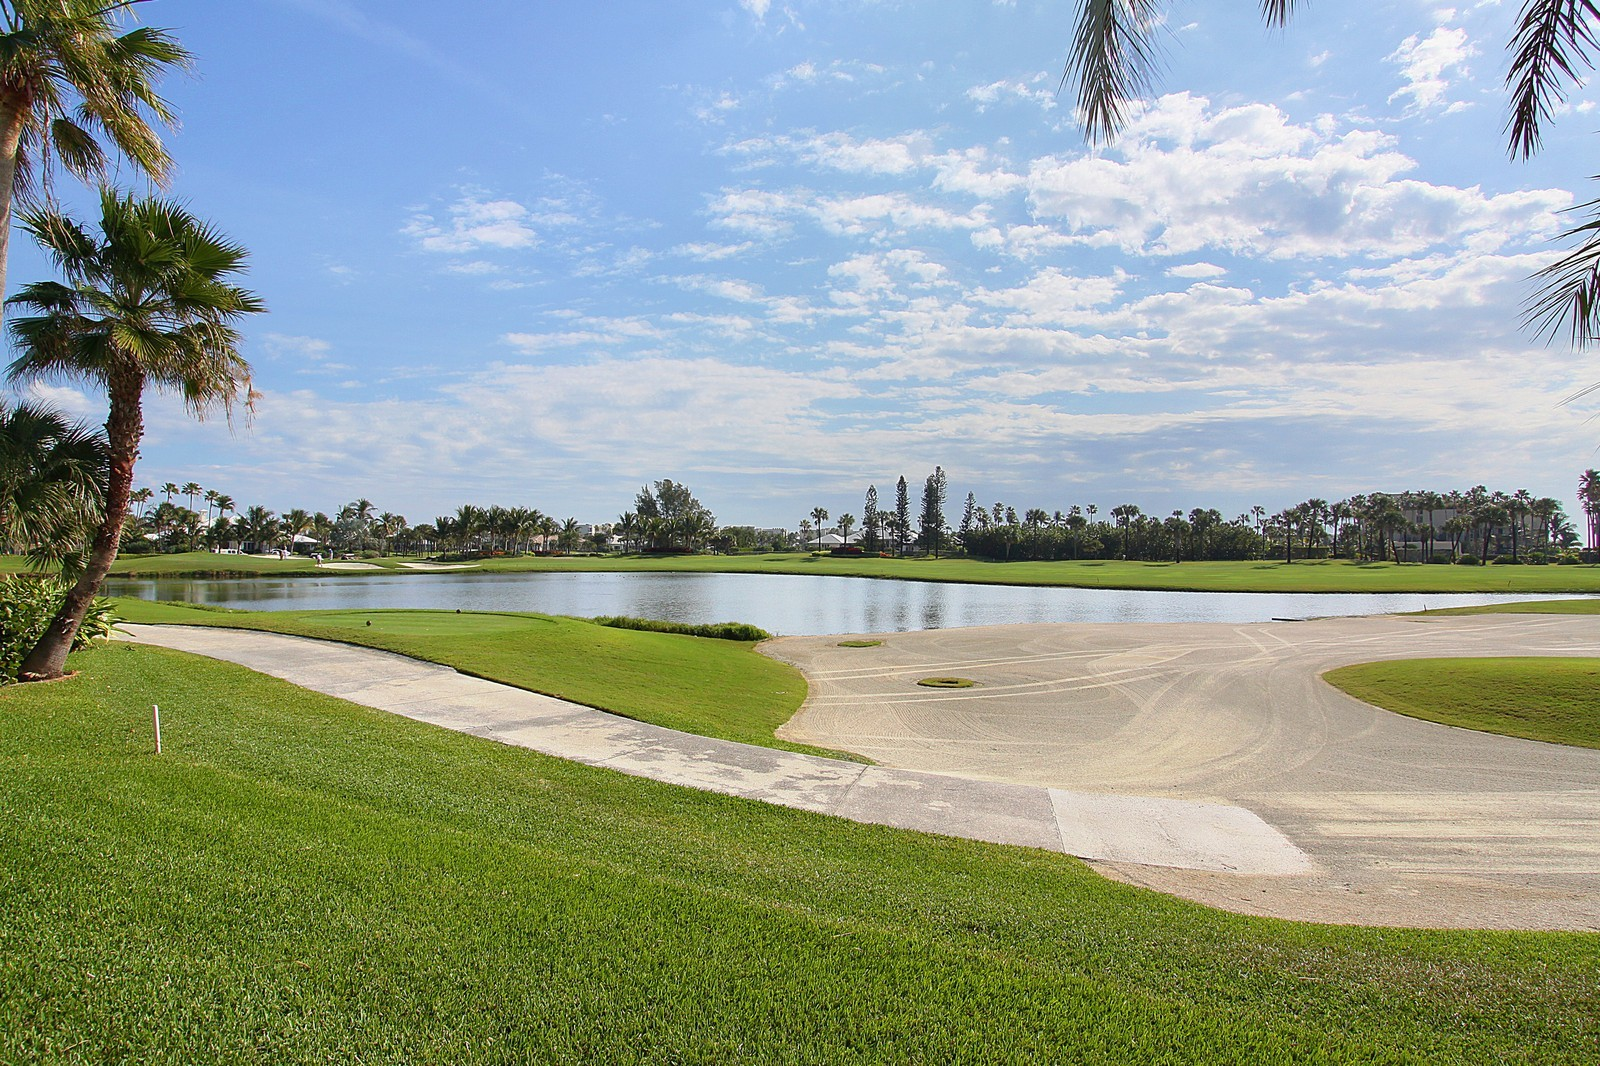 Real Estate Photography - 6930 SE Lakeview Ter, Stuart, FL, 34996 - View